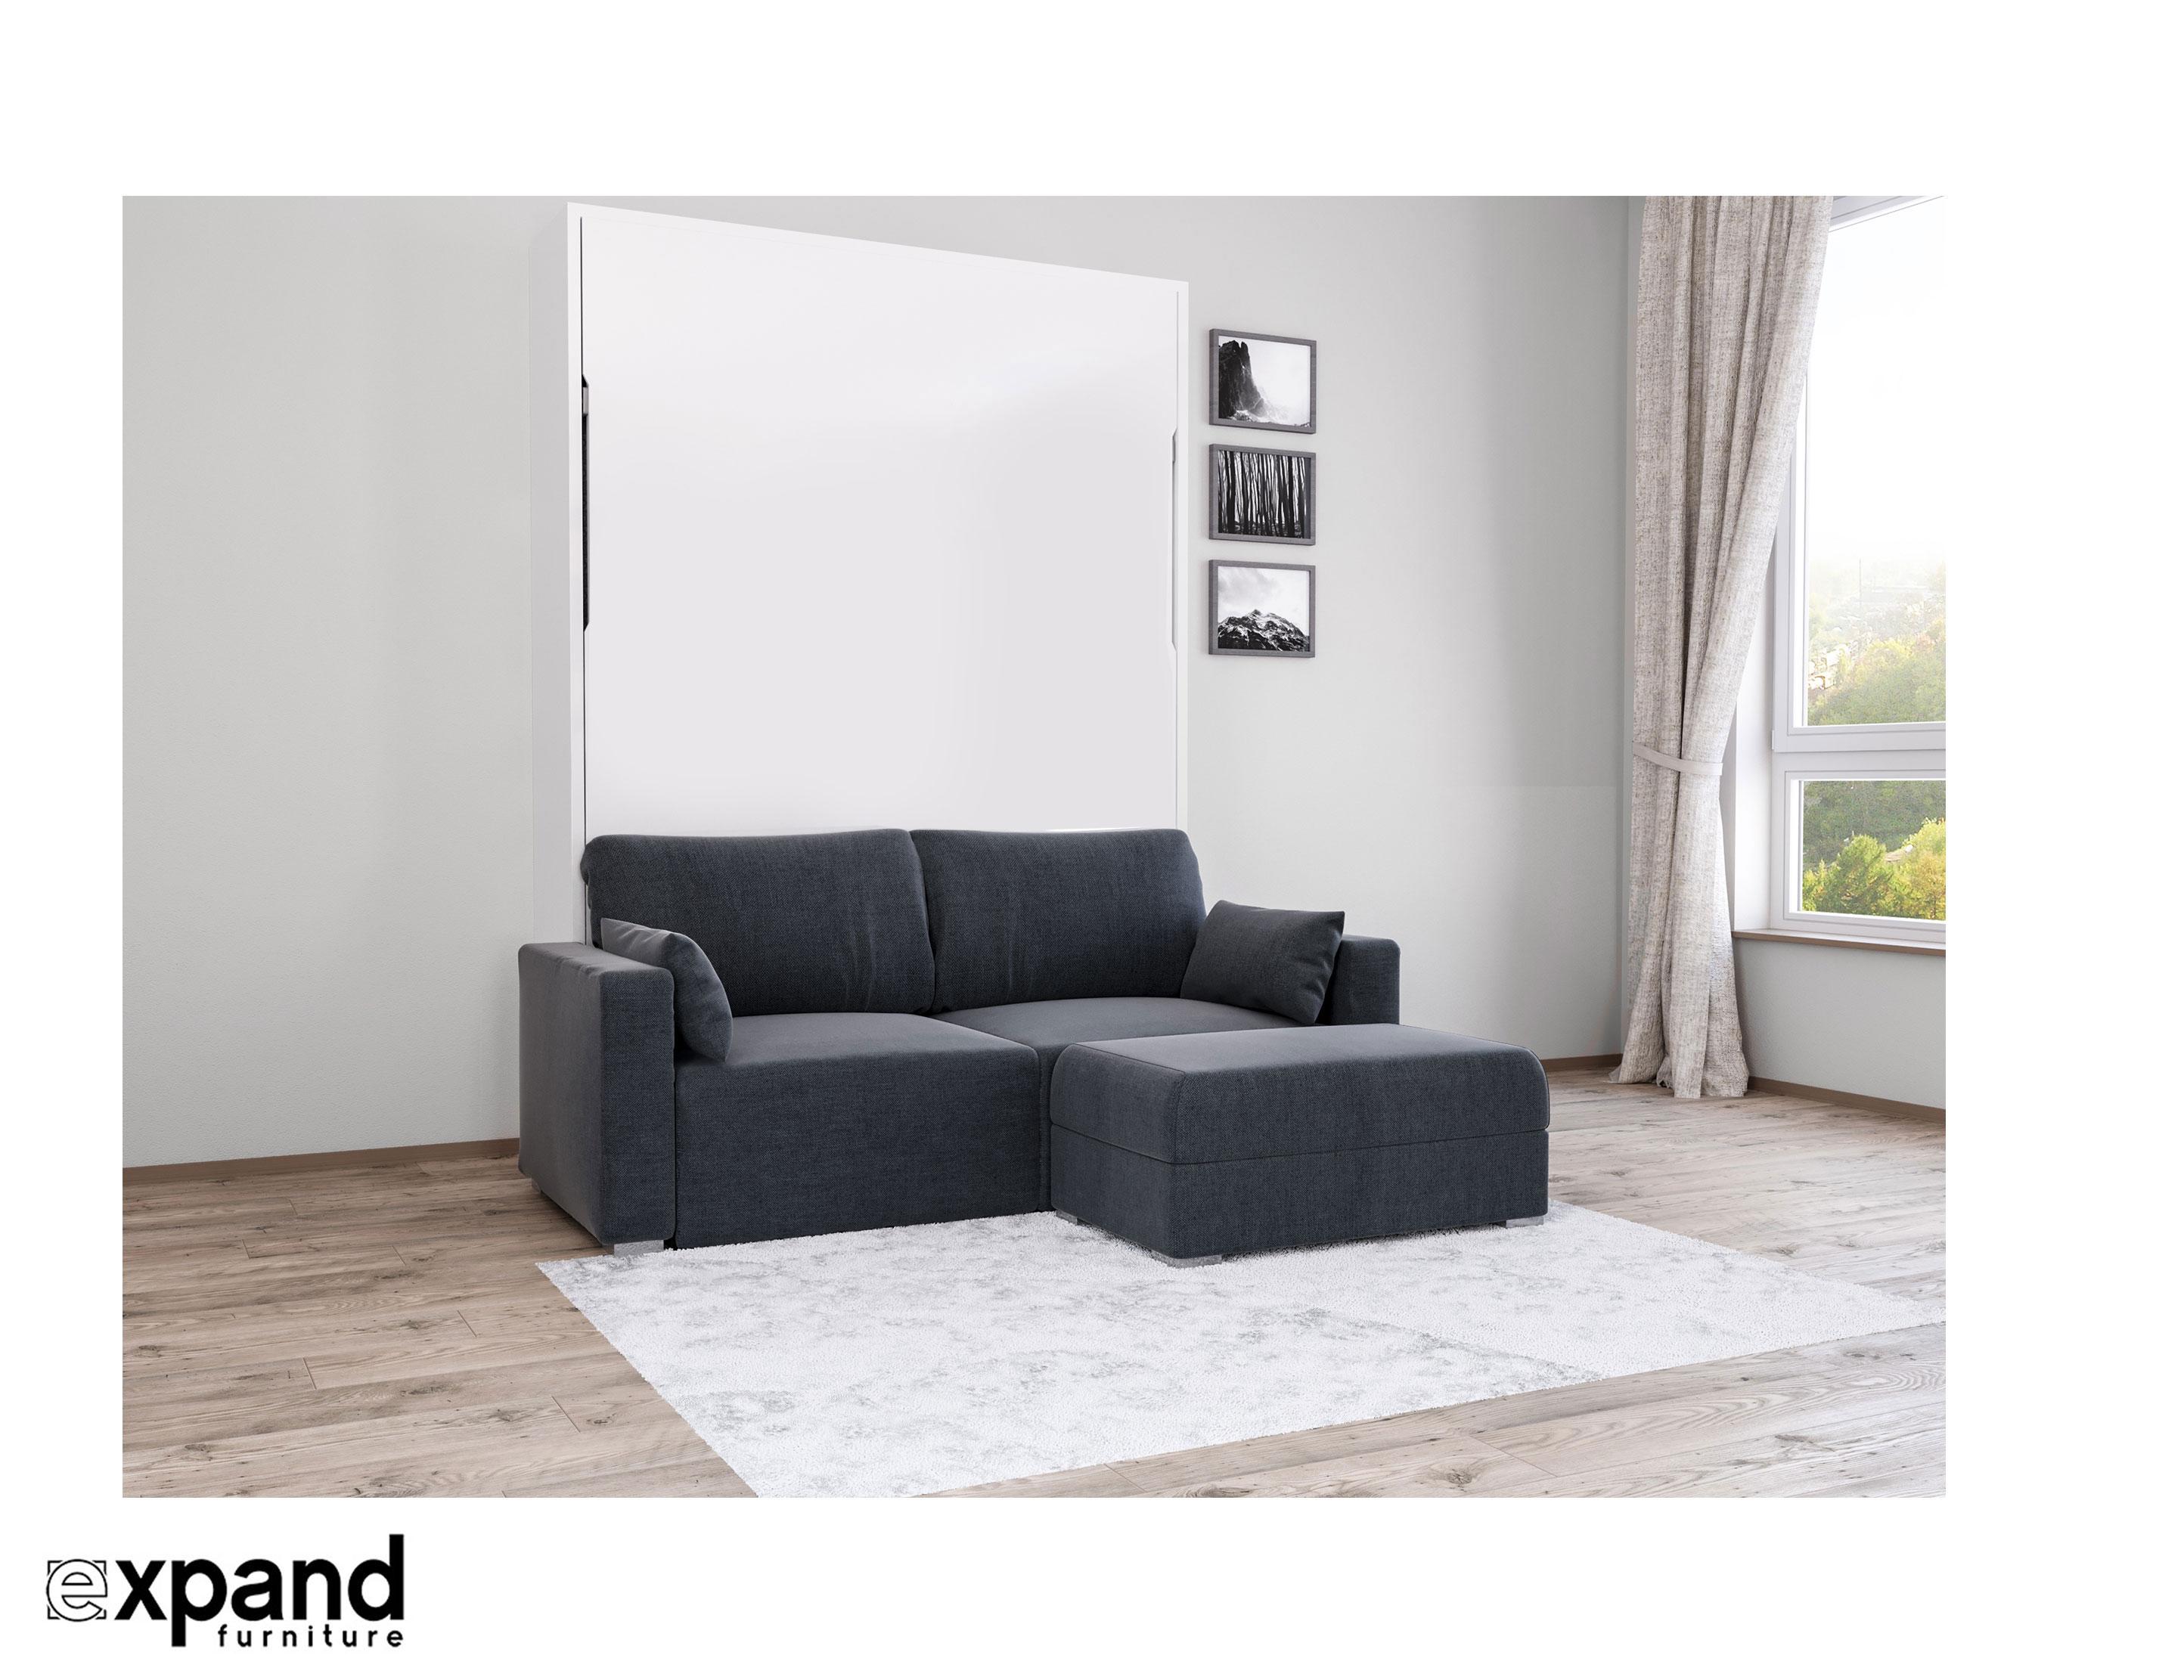 sofa murphy bed combination wrap in plastic murphysofa - minima sectional | expand furniture folding ...